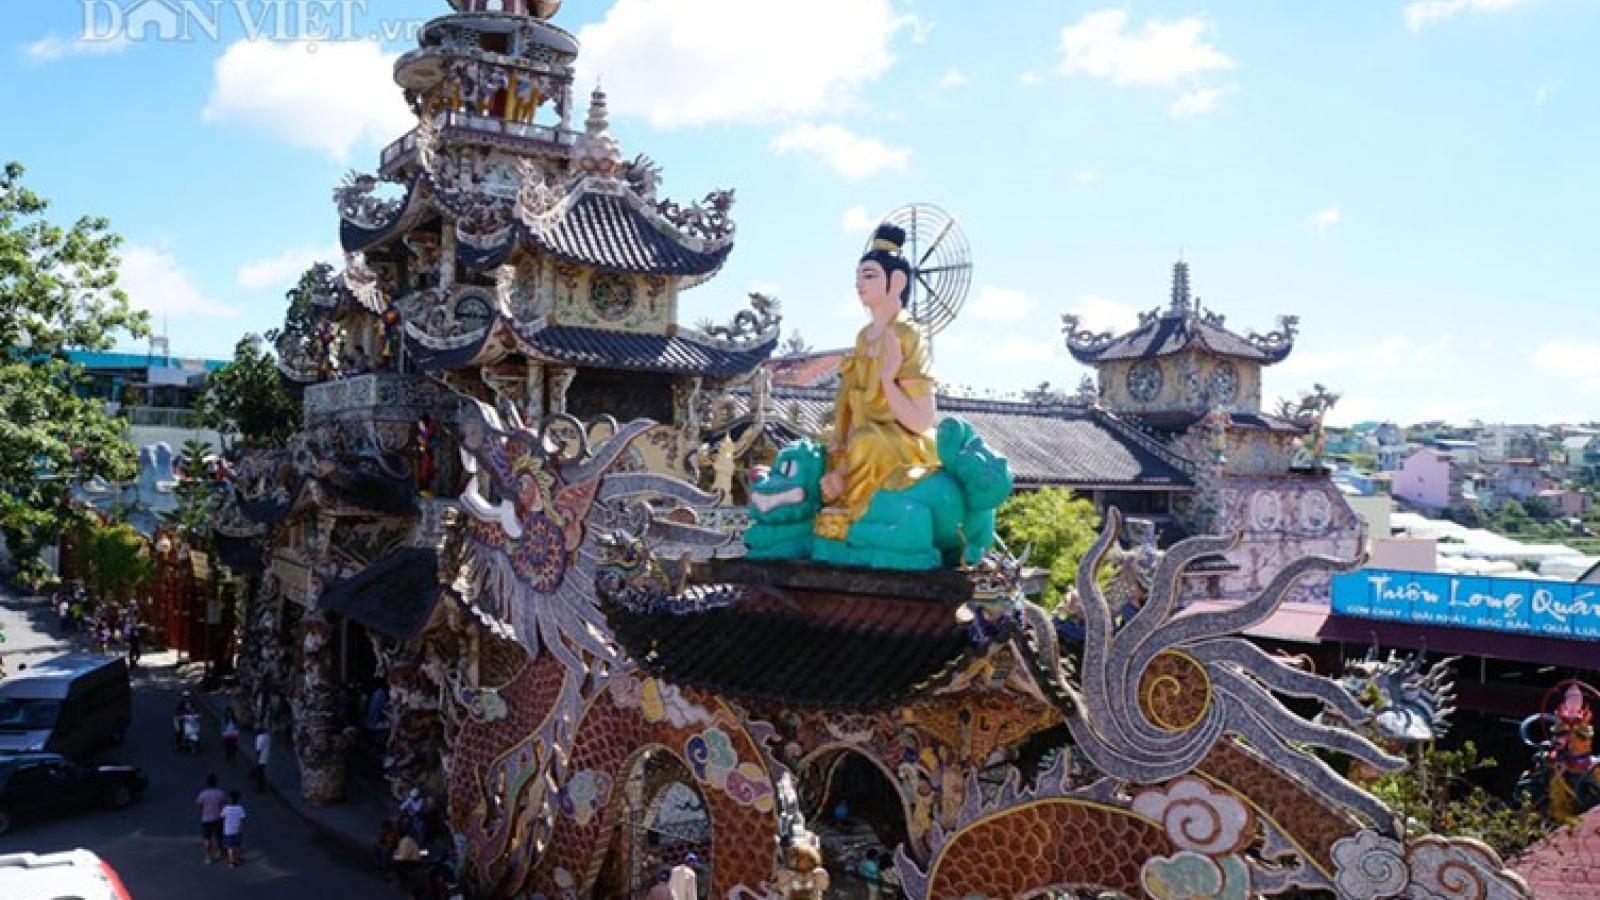 Linh Phuoc Pagoda-most unique architecture in Vietnam